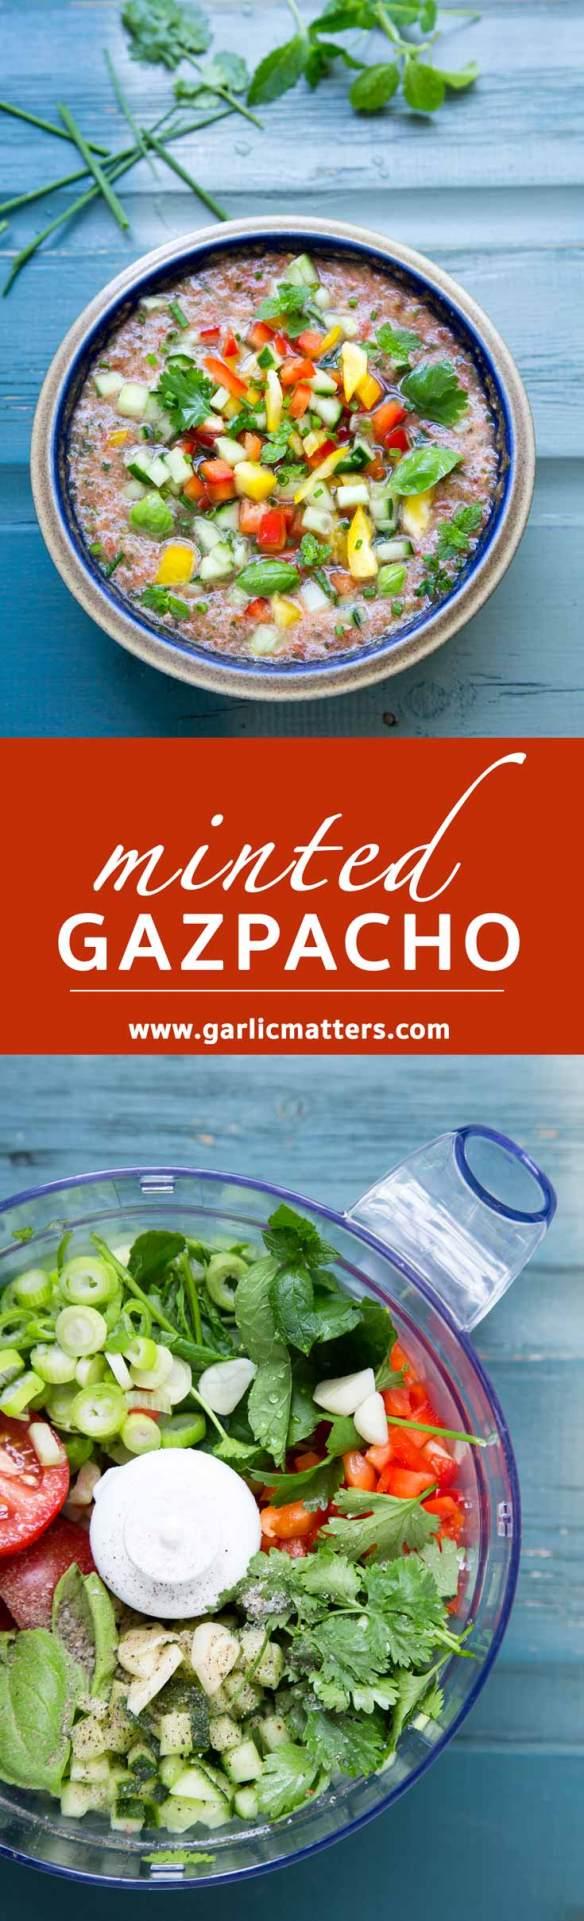 Minted Summer Gazpacho soup recipe